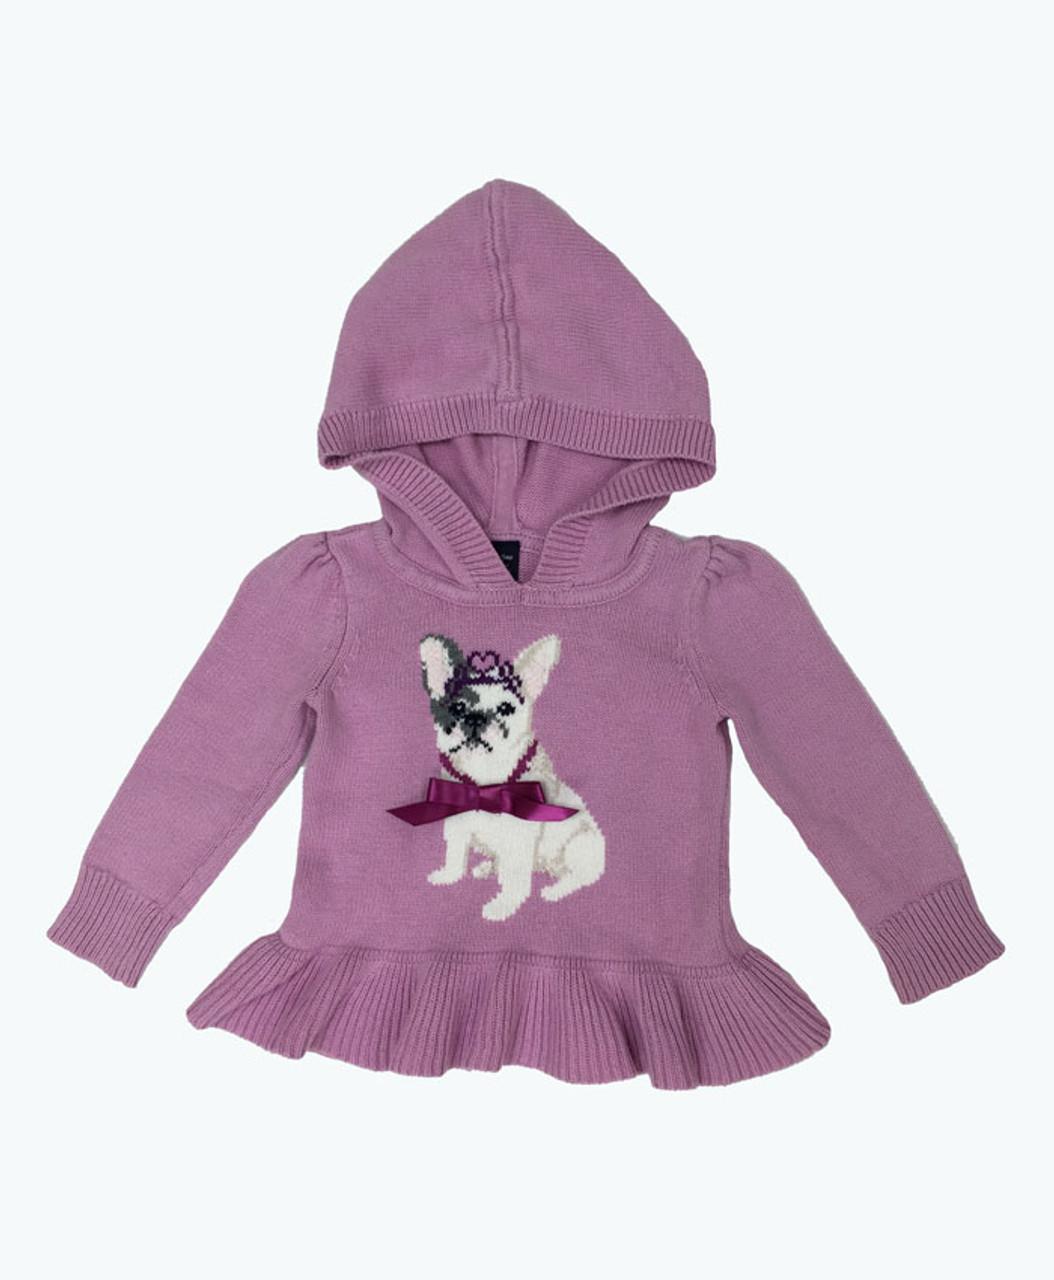 ec8a5758c Baby Gap baby girls sweater